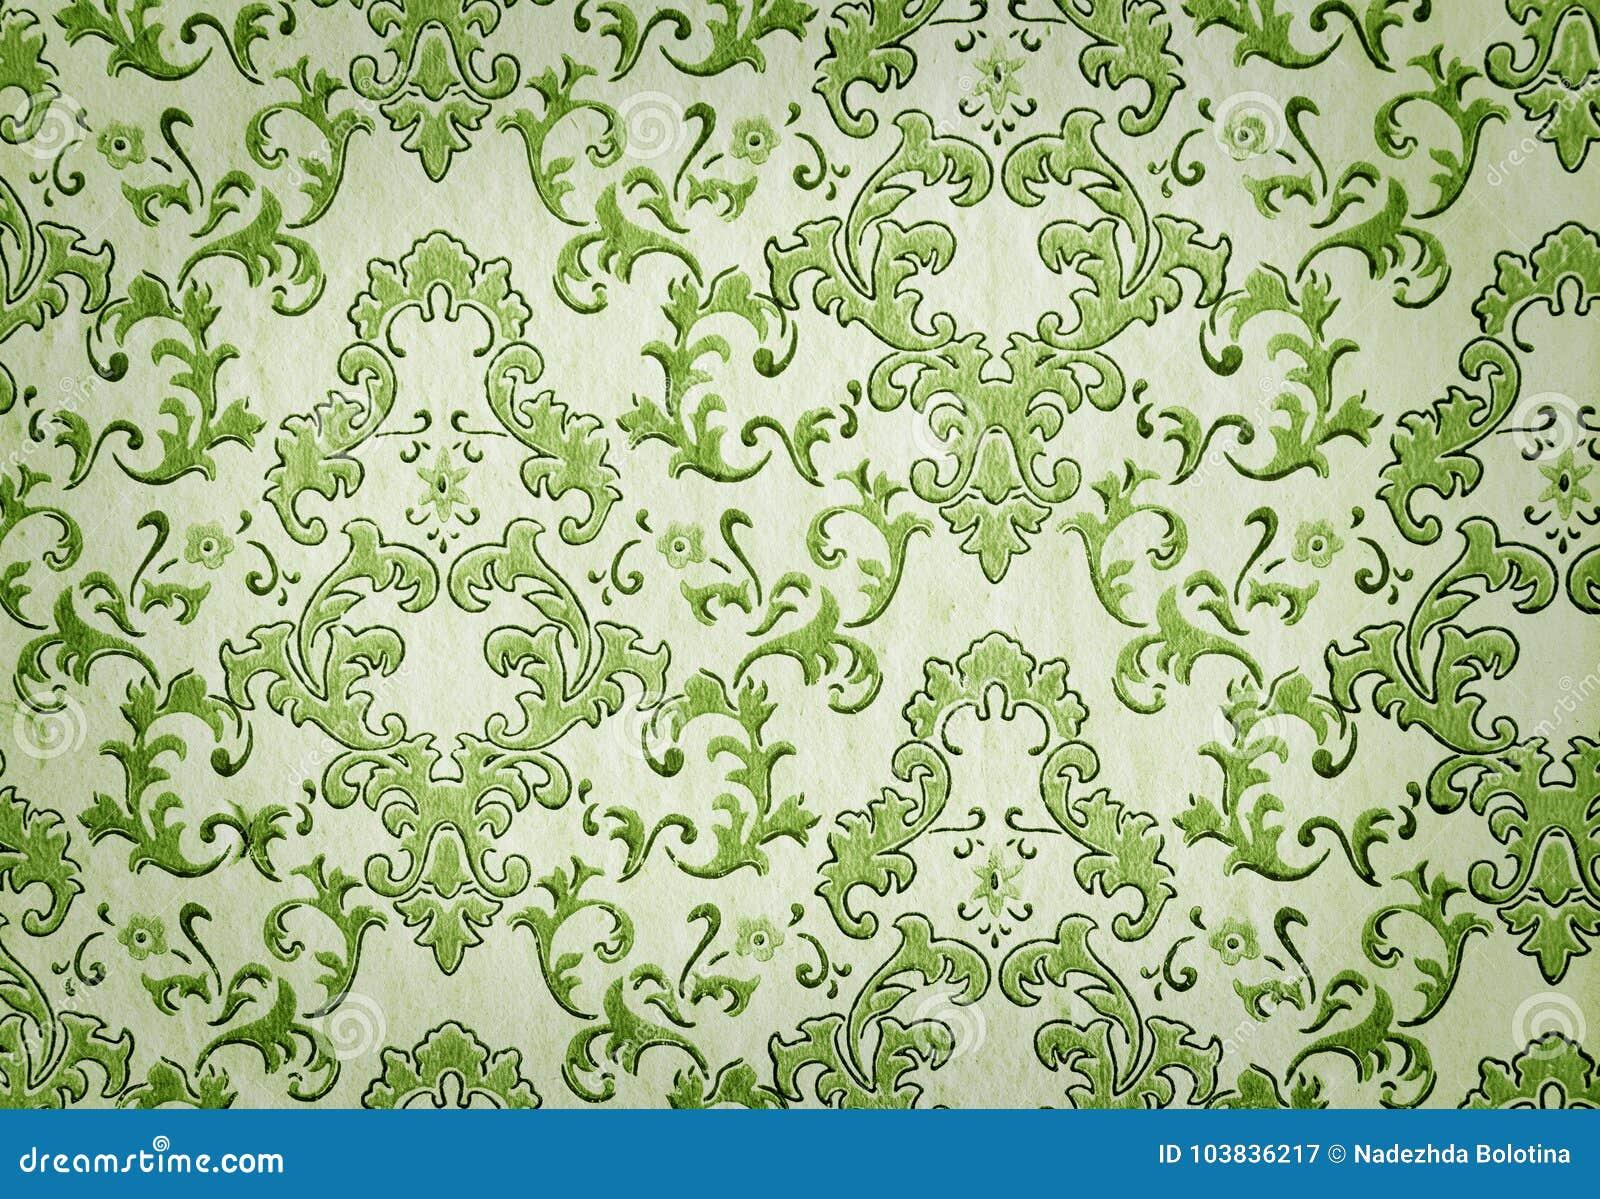 Behang Oud Groen.Oud Groen Behang Stock Afbeelding Afbeelding Bestaande Uit Grunge